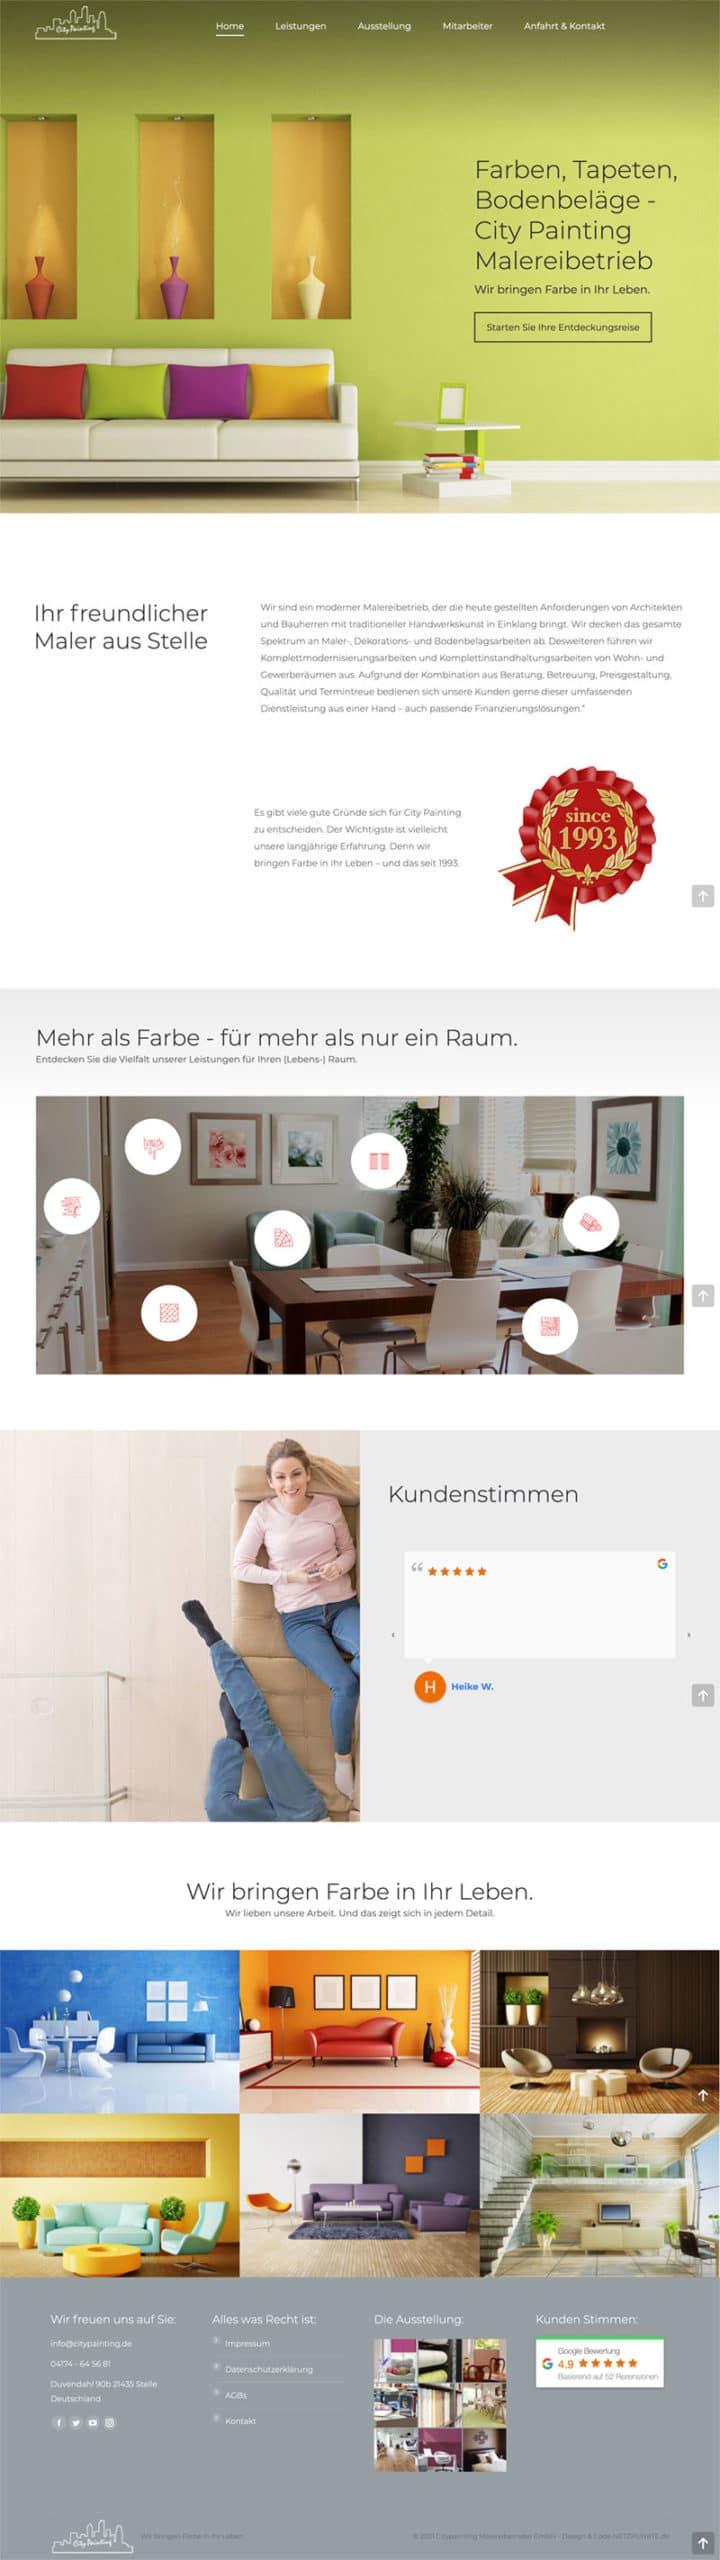 referenz-webdesign-citypainting-malereibetrieb